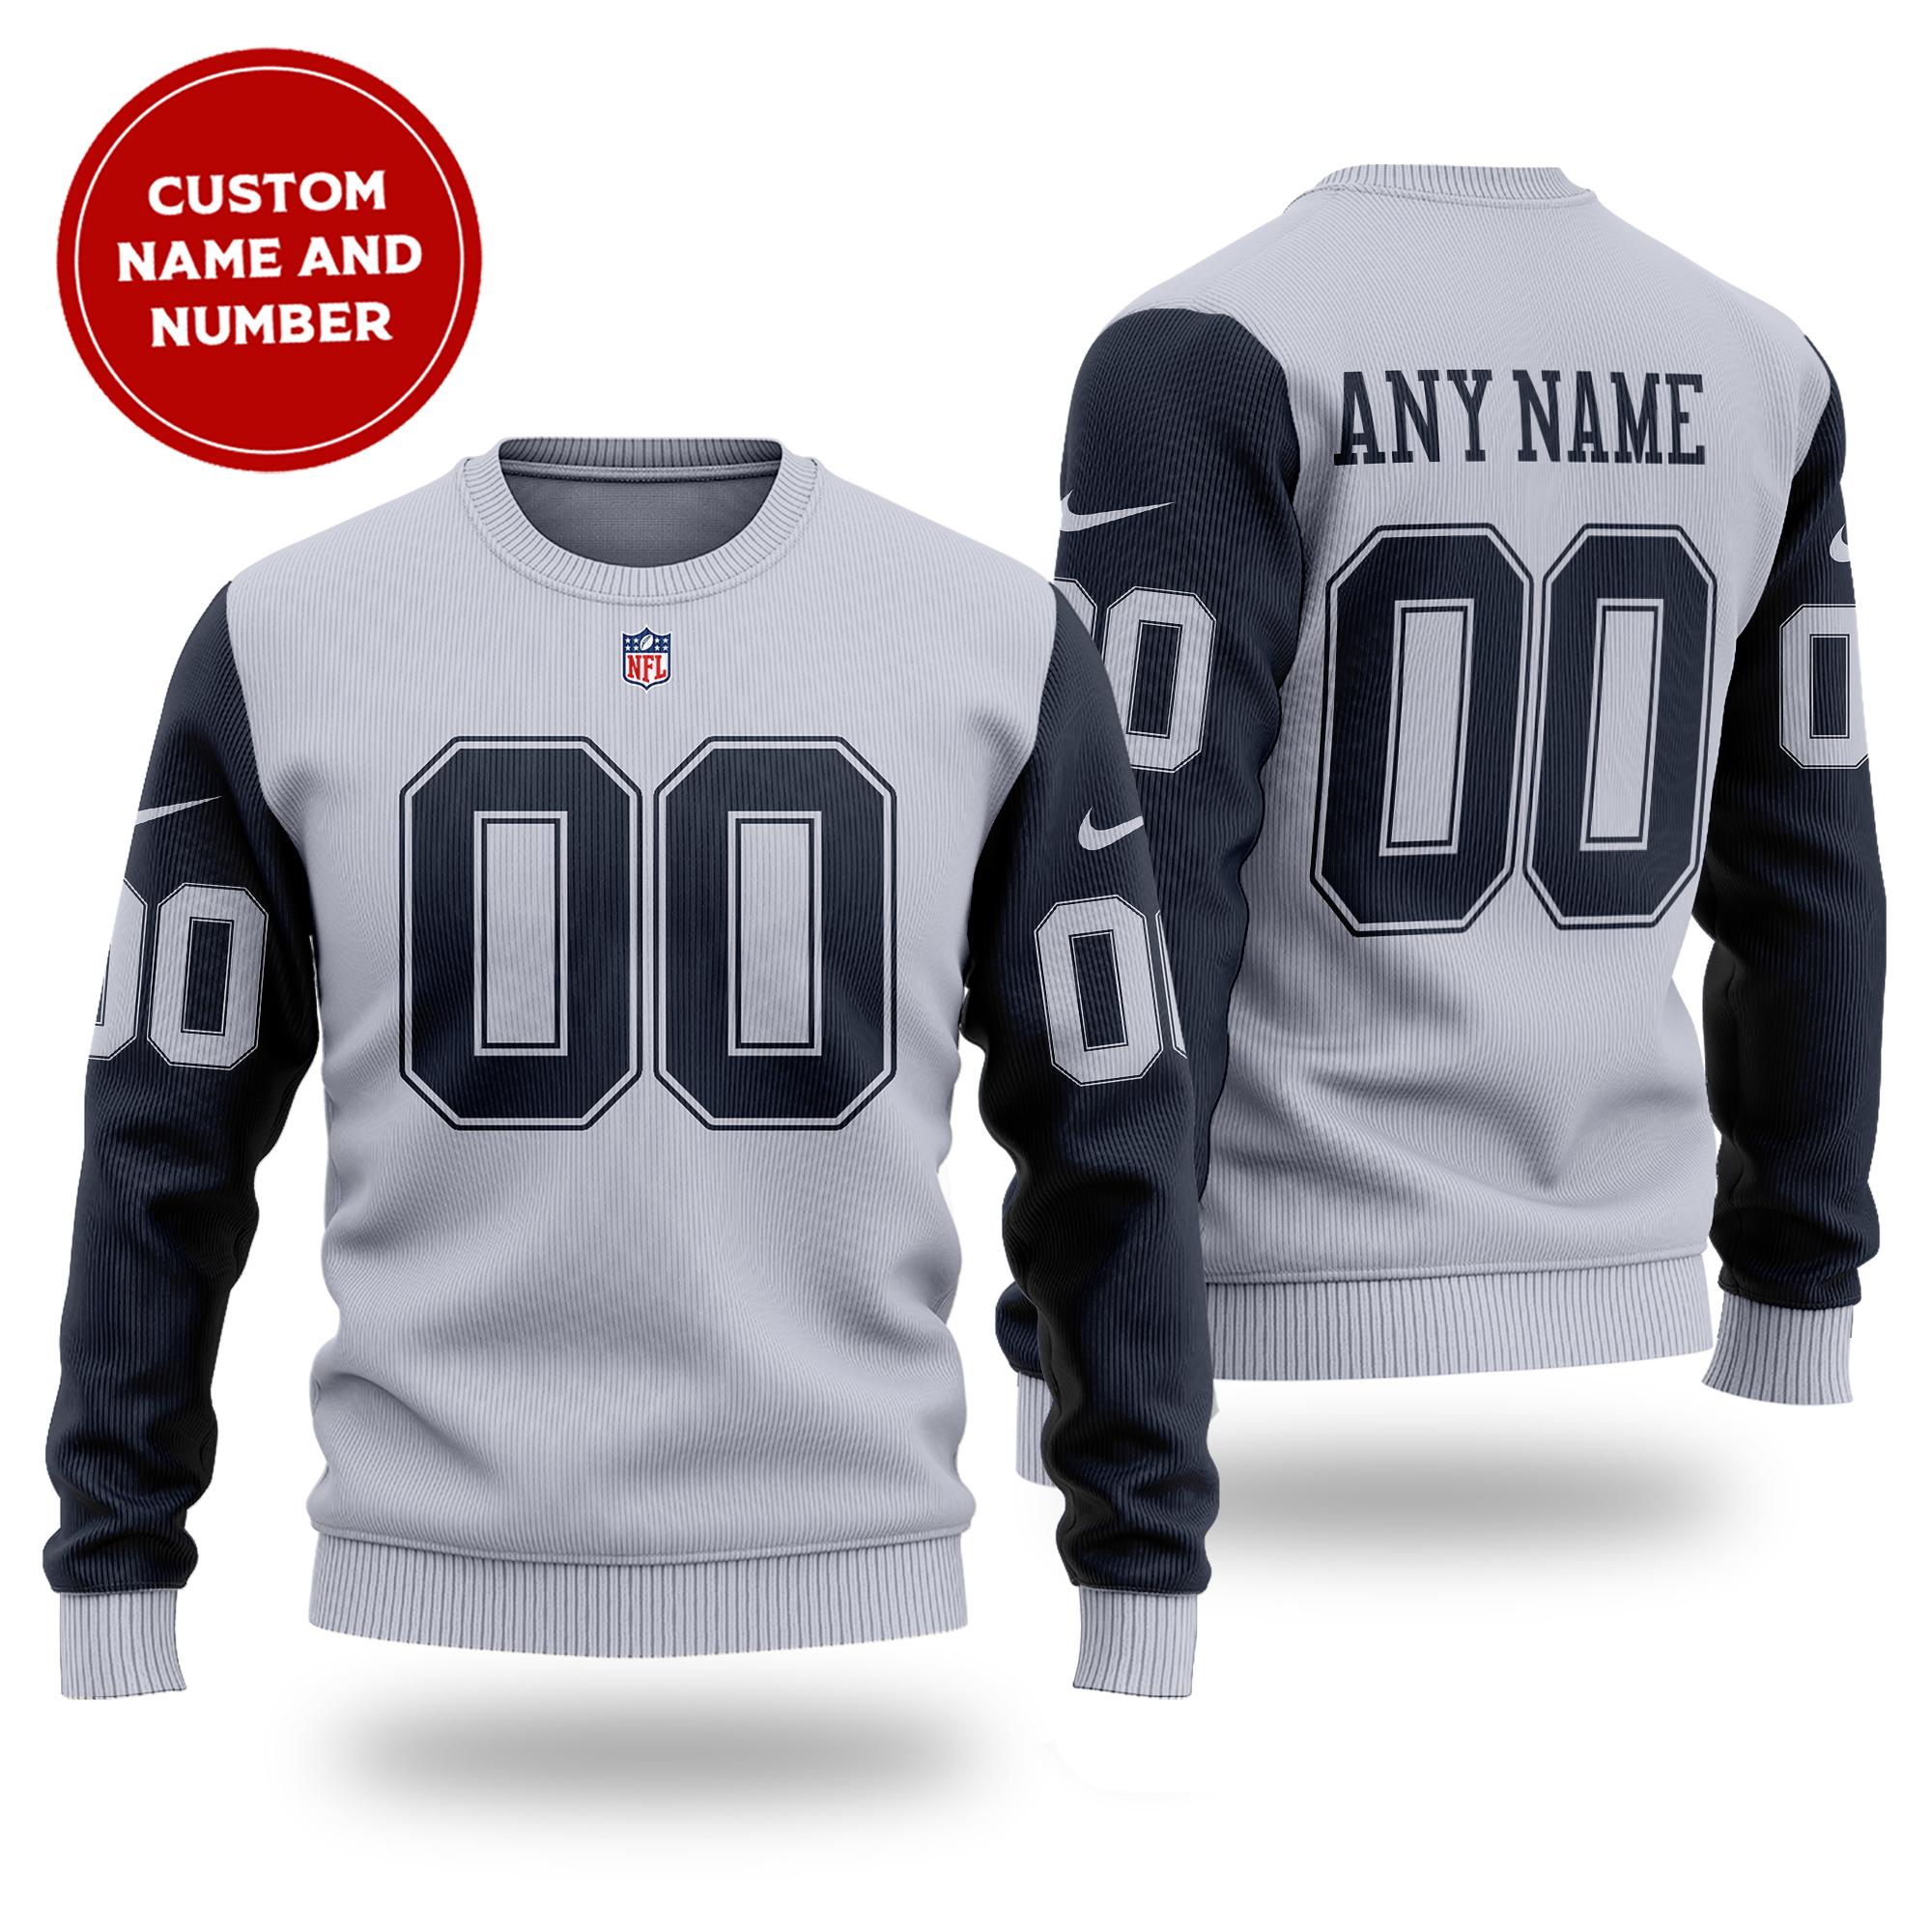 Customized NFL DALLAS COWBOYS grey wool Sweater